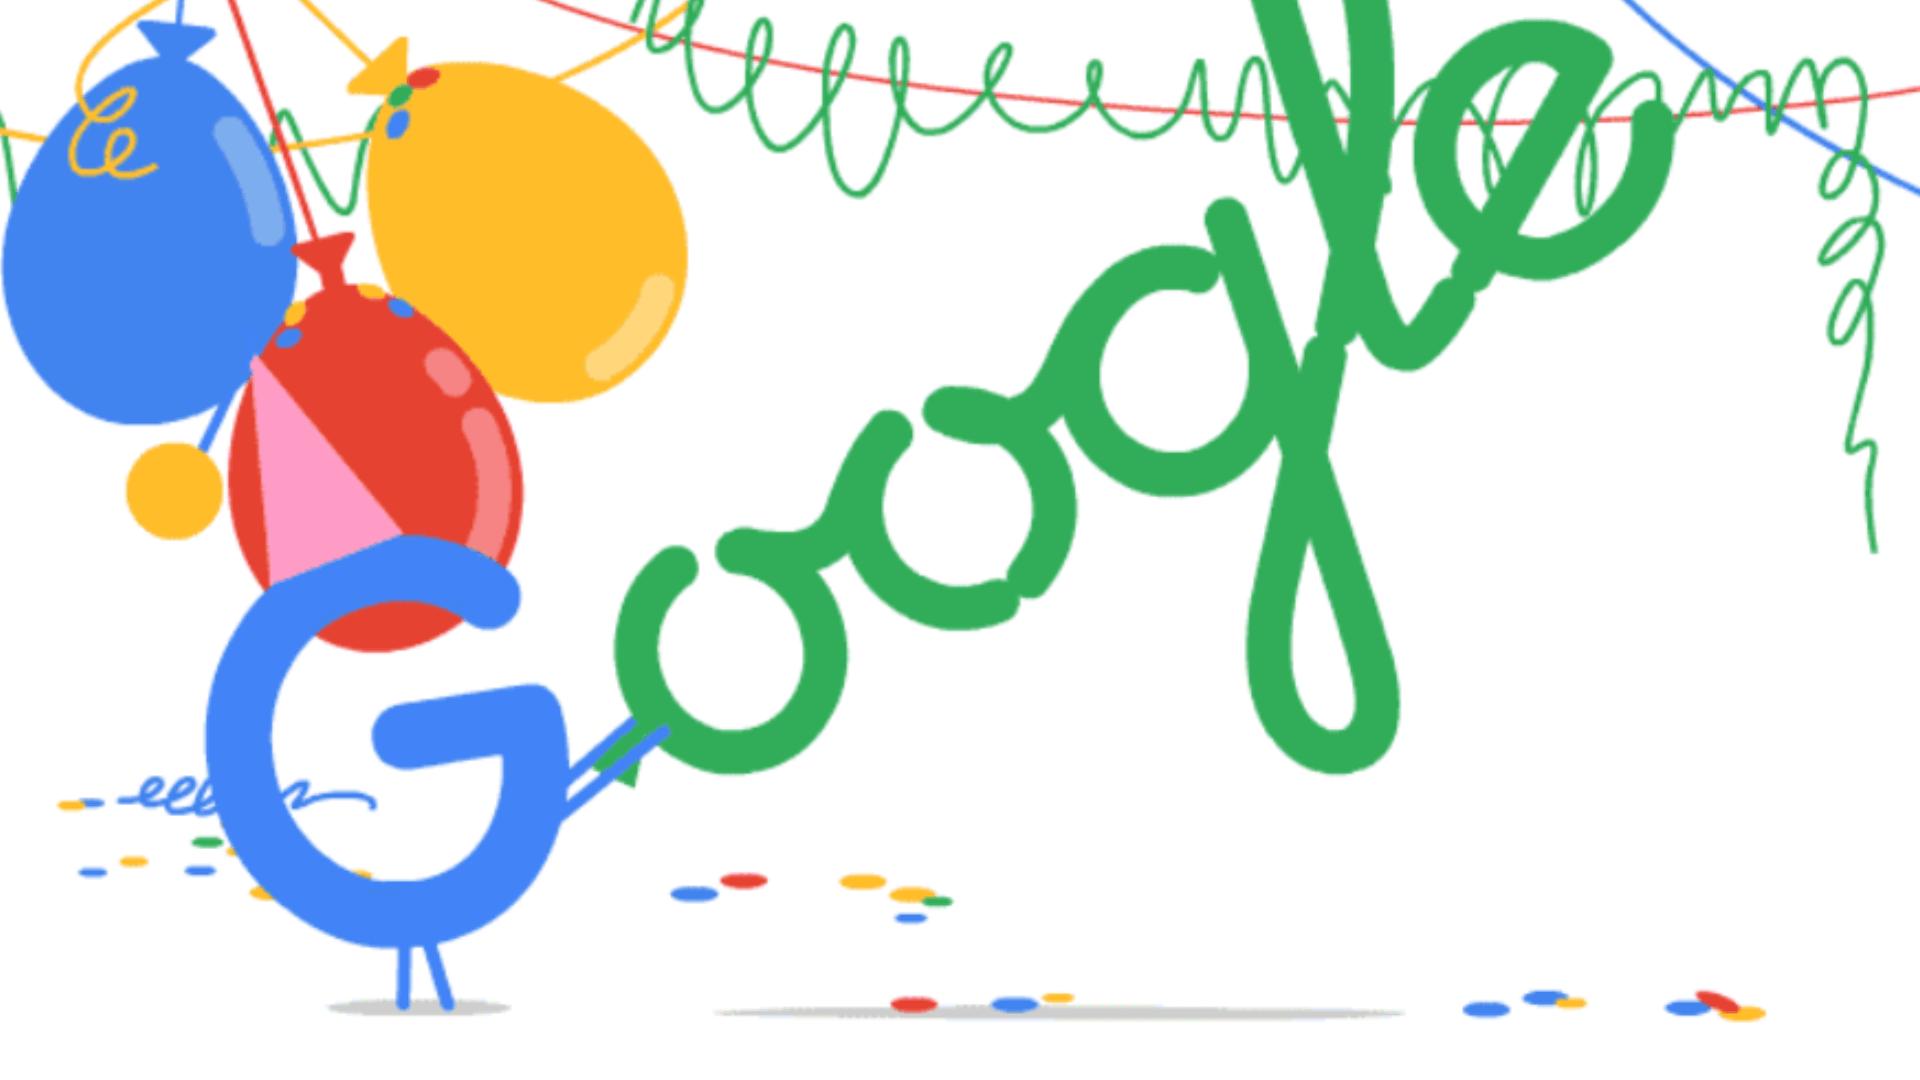 Commemorating 20 years of Google